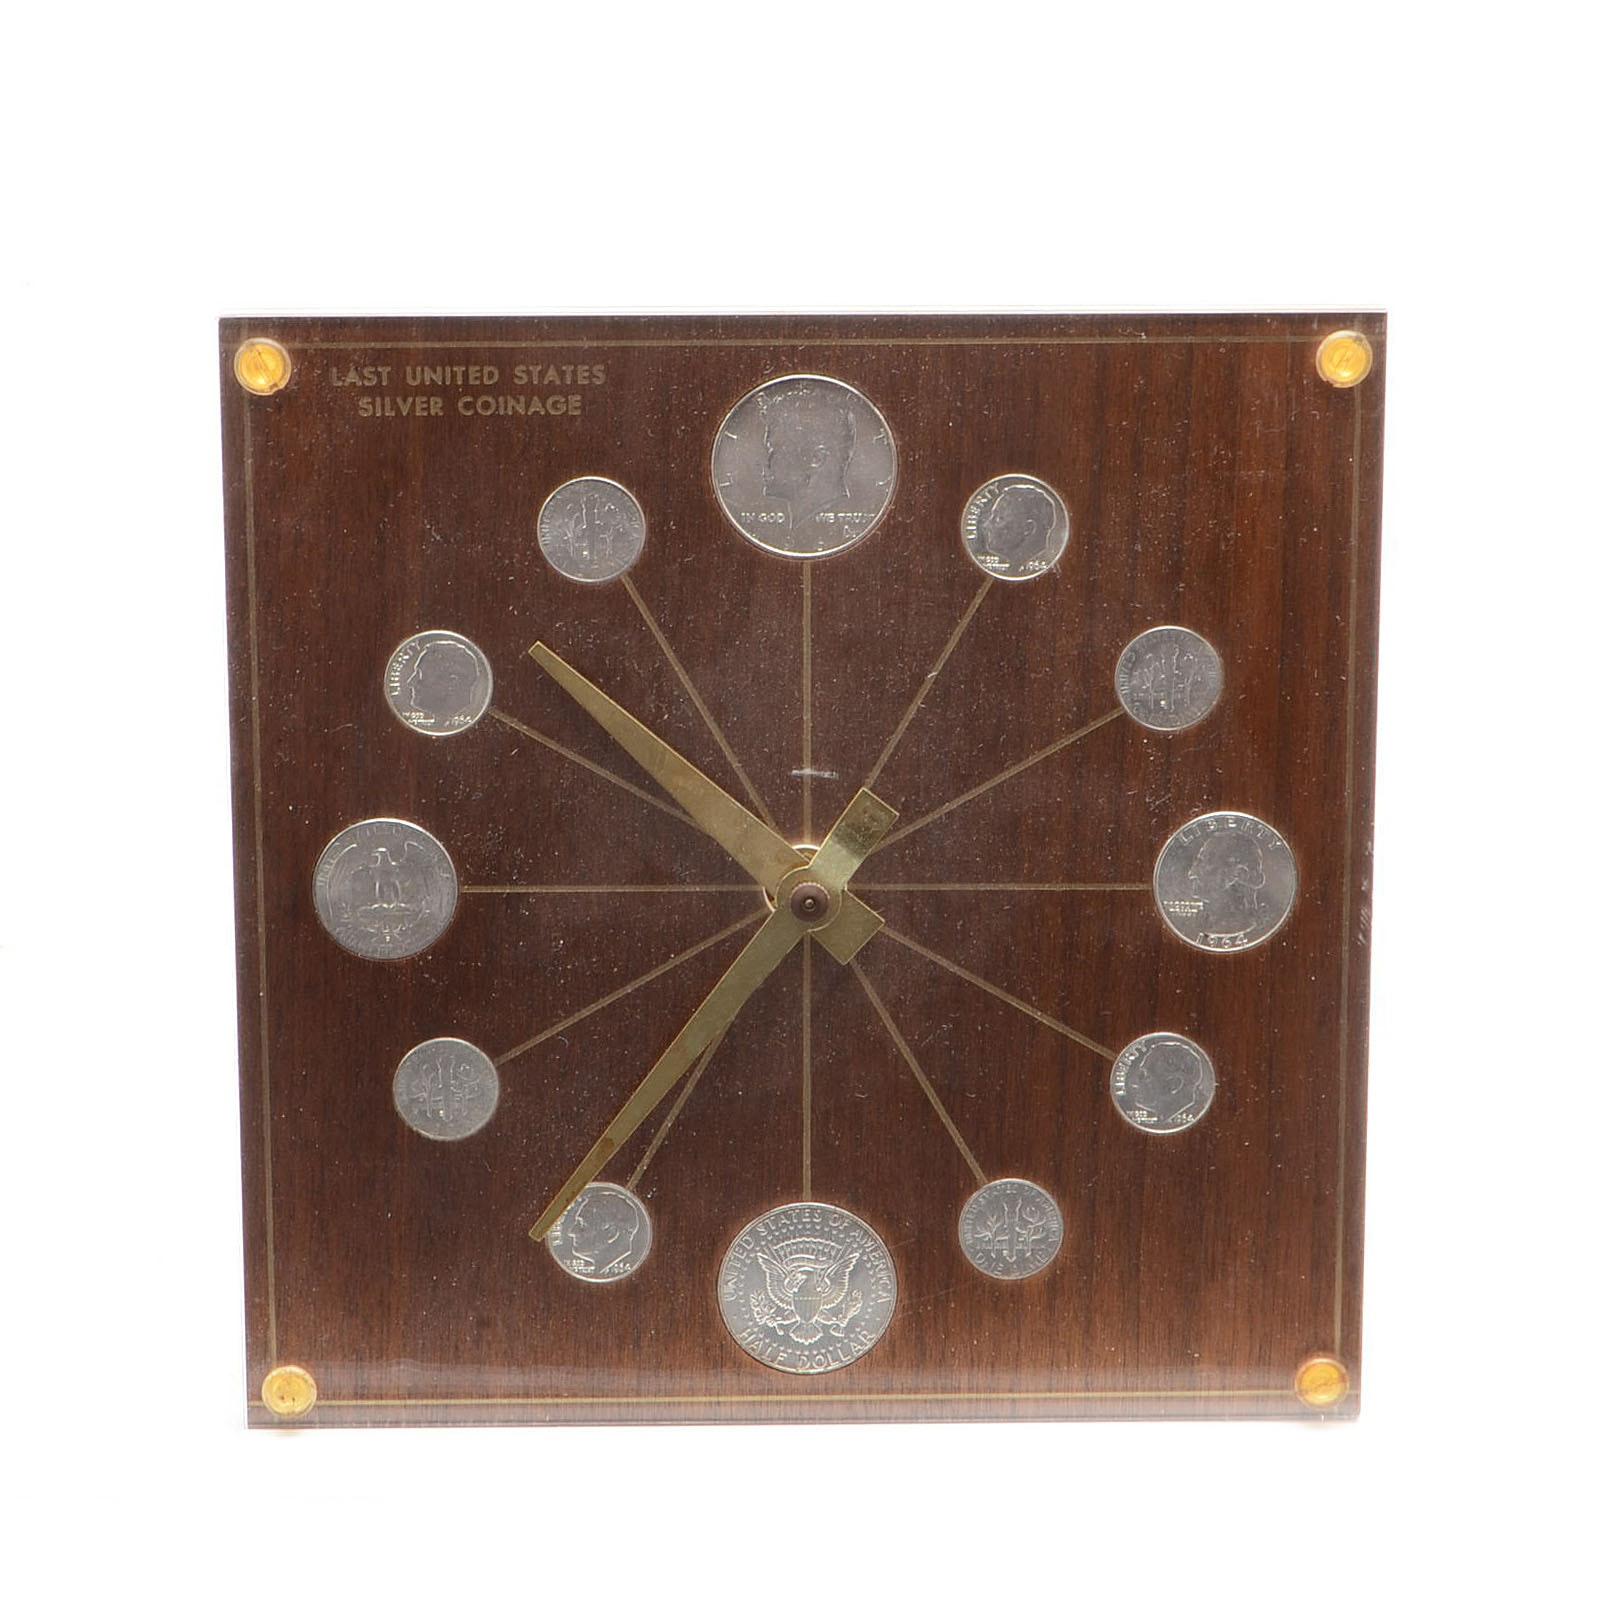 1964 Marion-Kay Last US Silver Coinage Numismatic Desk Clock